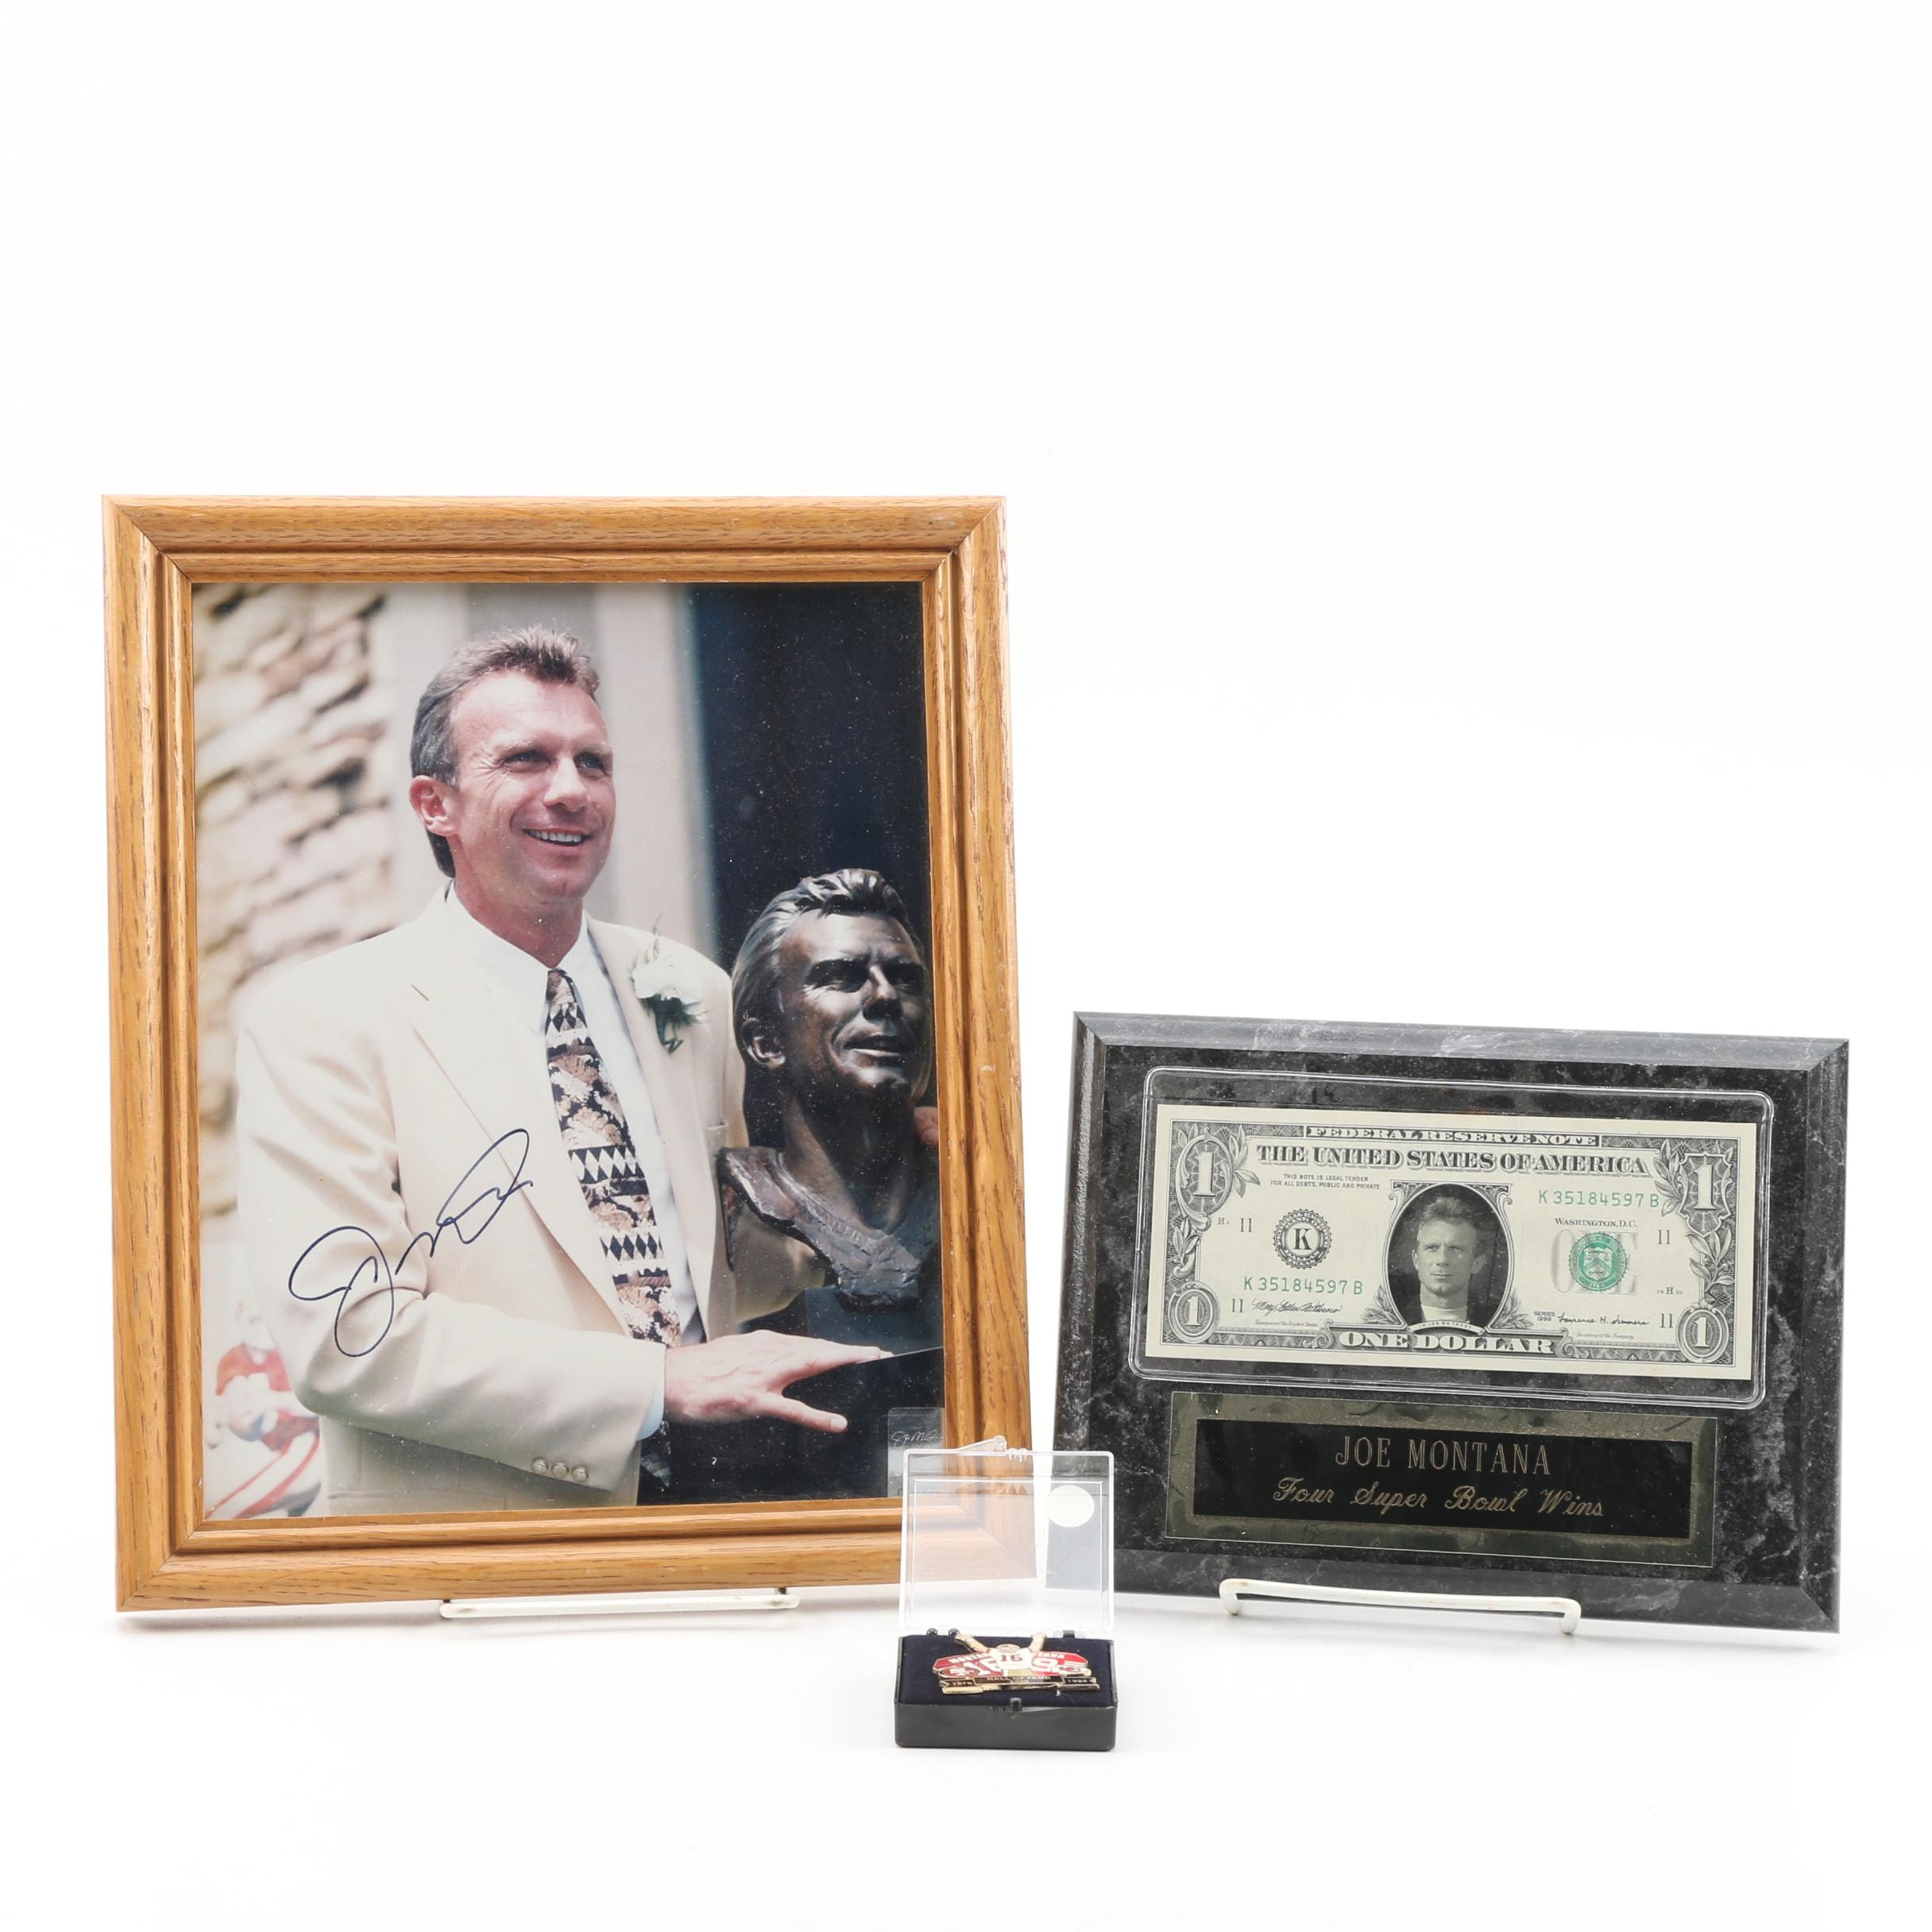 Joe Montana Autographed Photograph and Collectibles